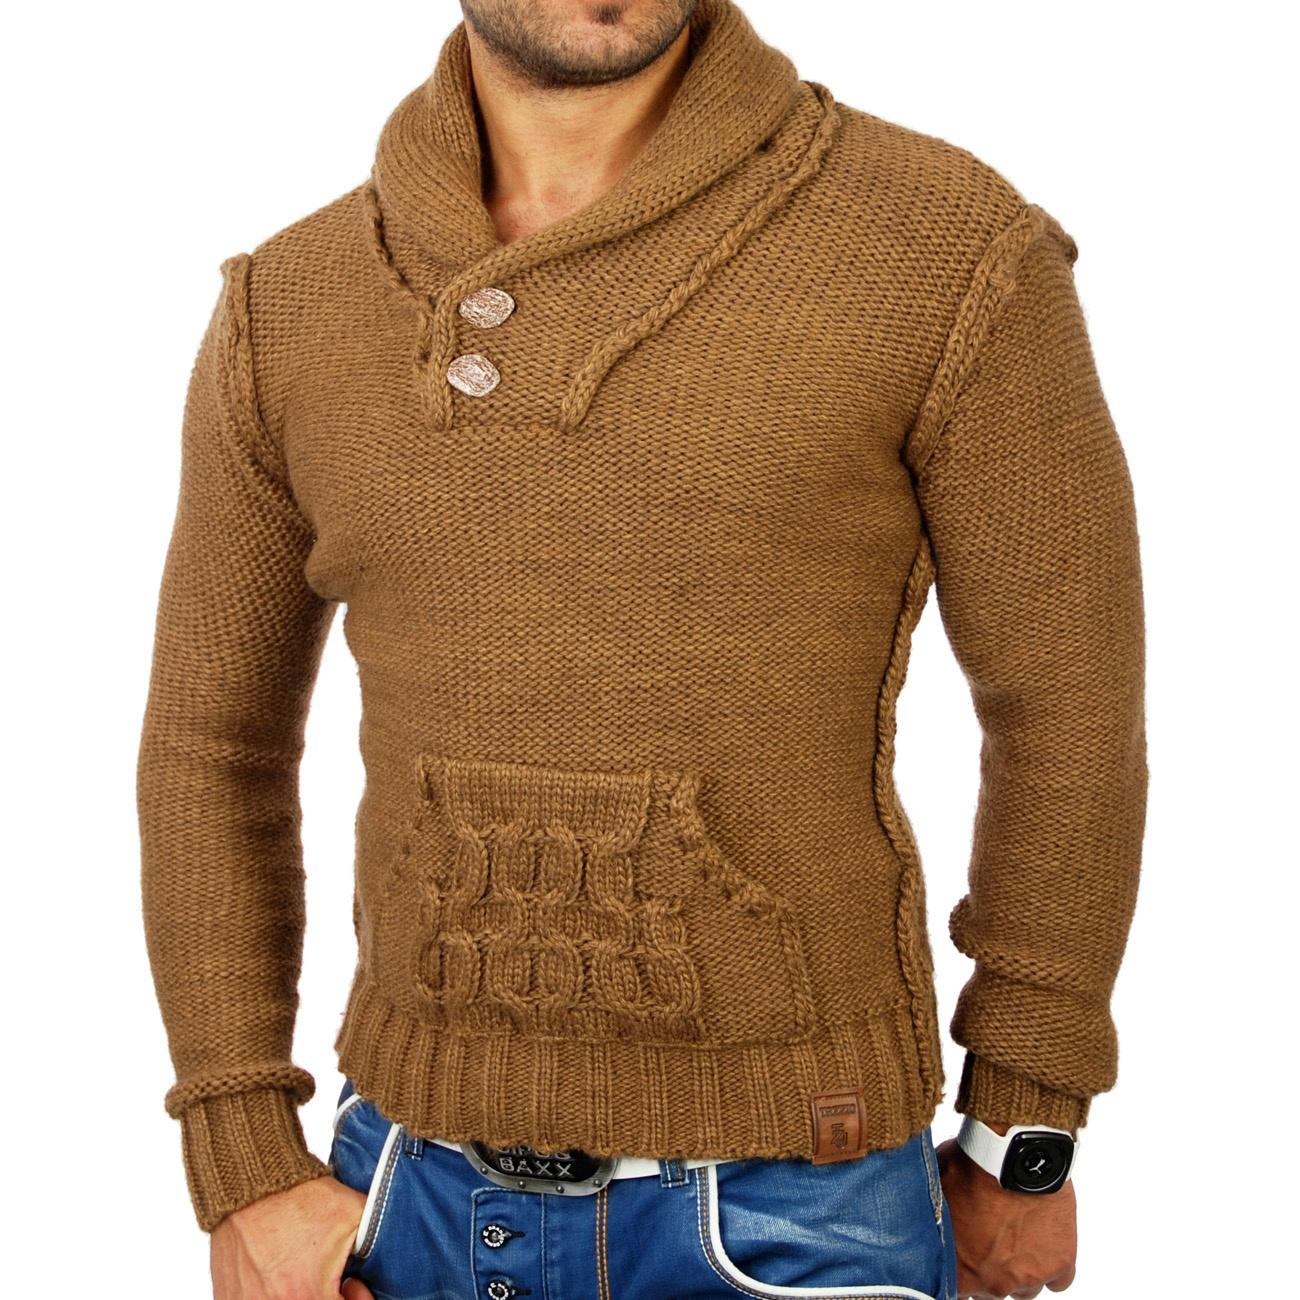 tazzio herren pullover grobstrick sweatshirt strickjacke jacke tz 3565 camel ebay. Black Bedroom Furniture Sets. Home Design Ideas